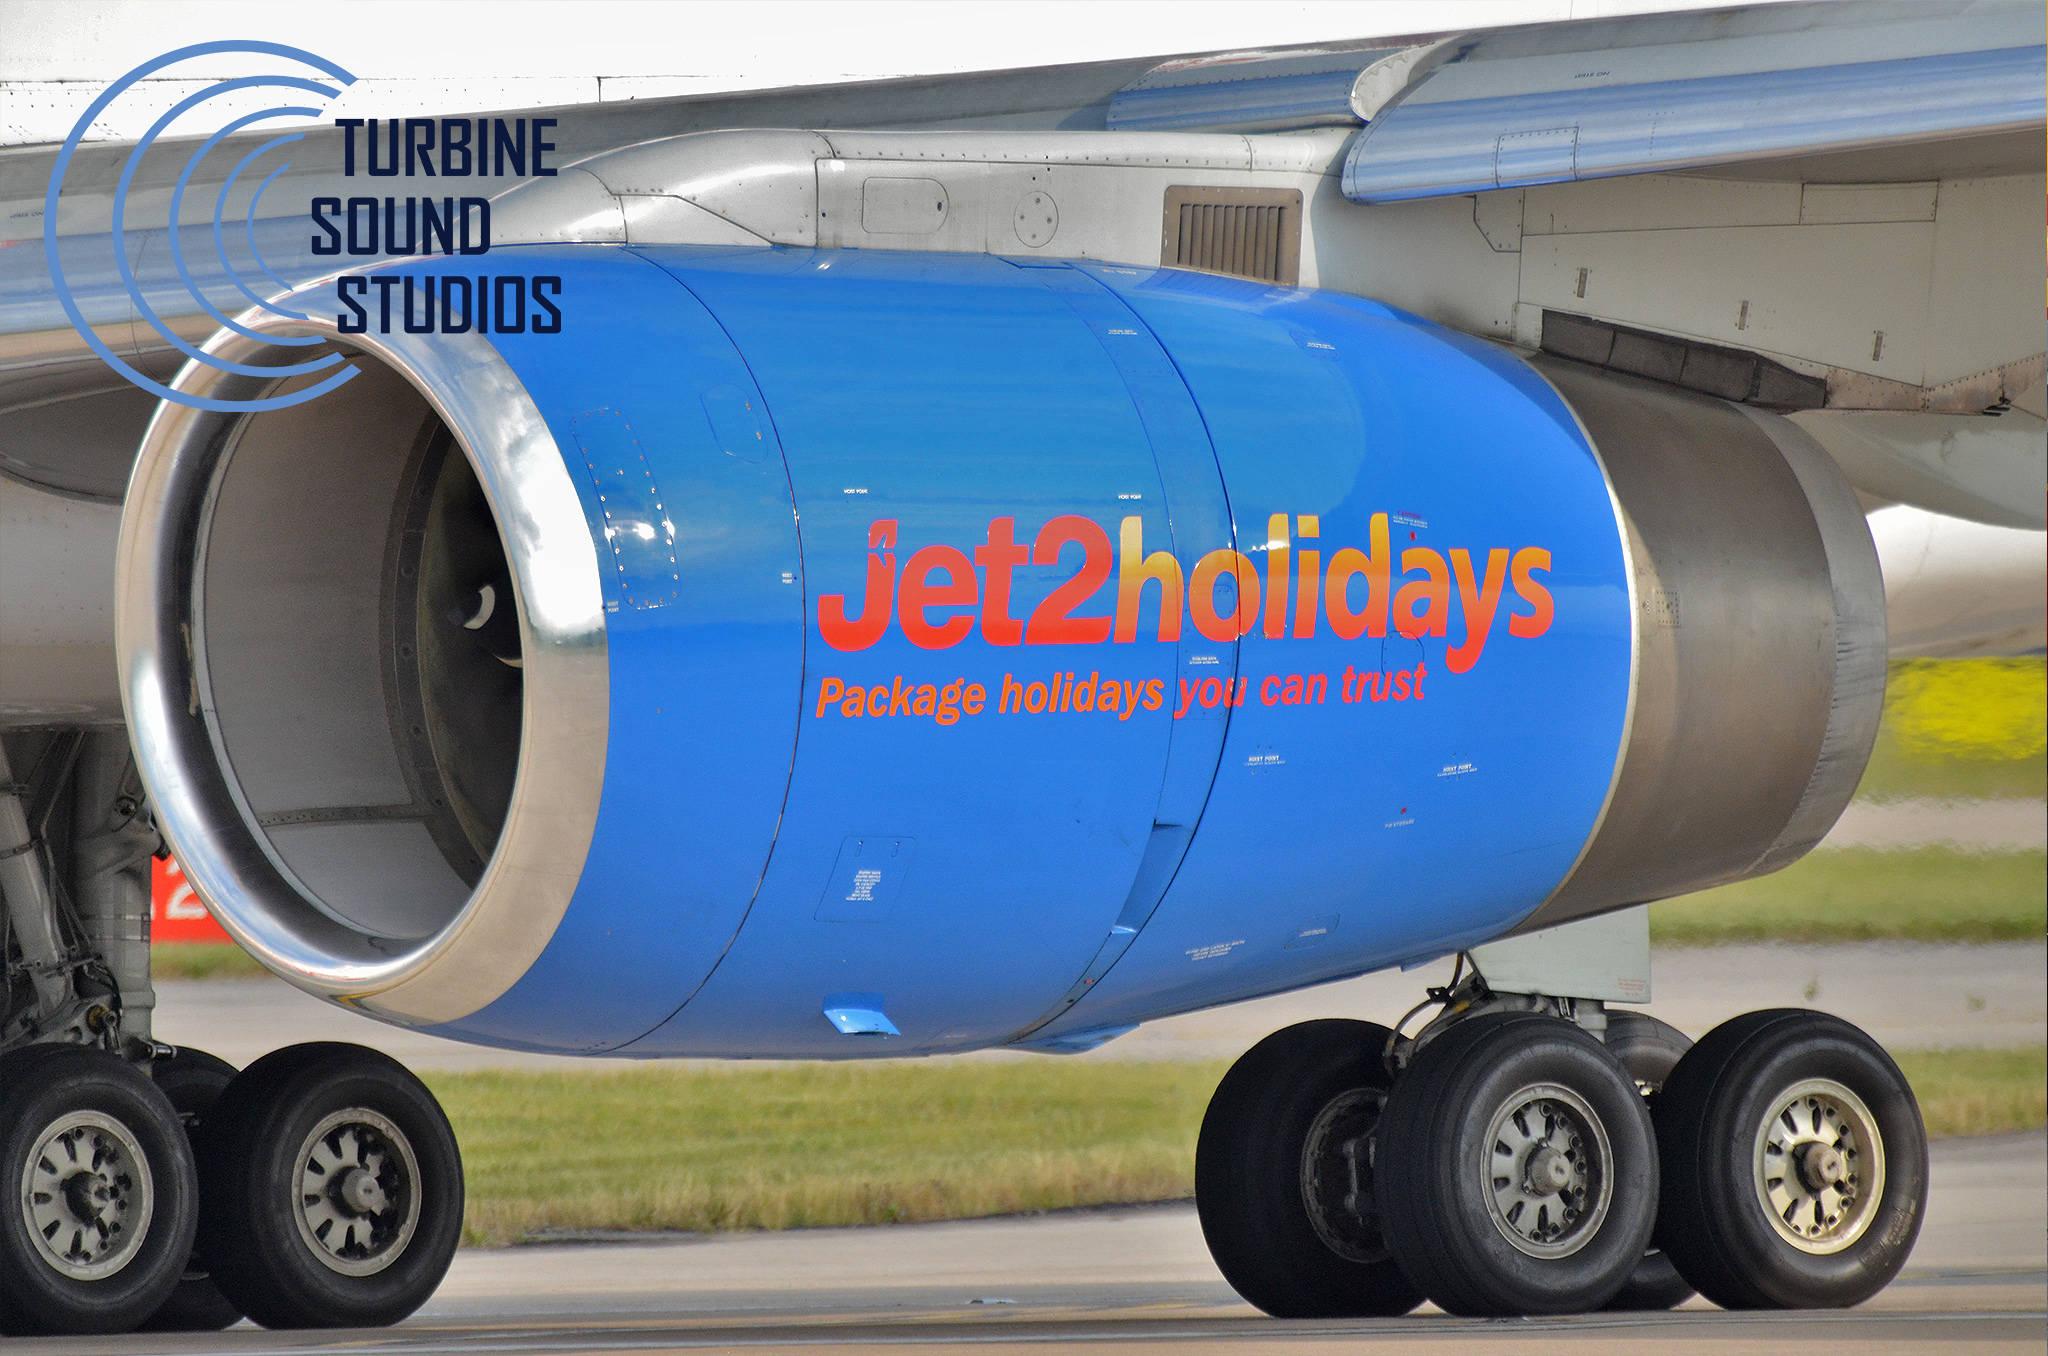 Just Flight - TSS Boeing 757 RB211-535E4 Pilot Edition Sound